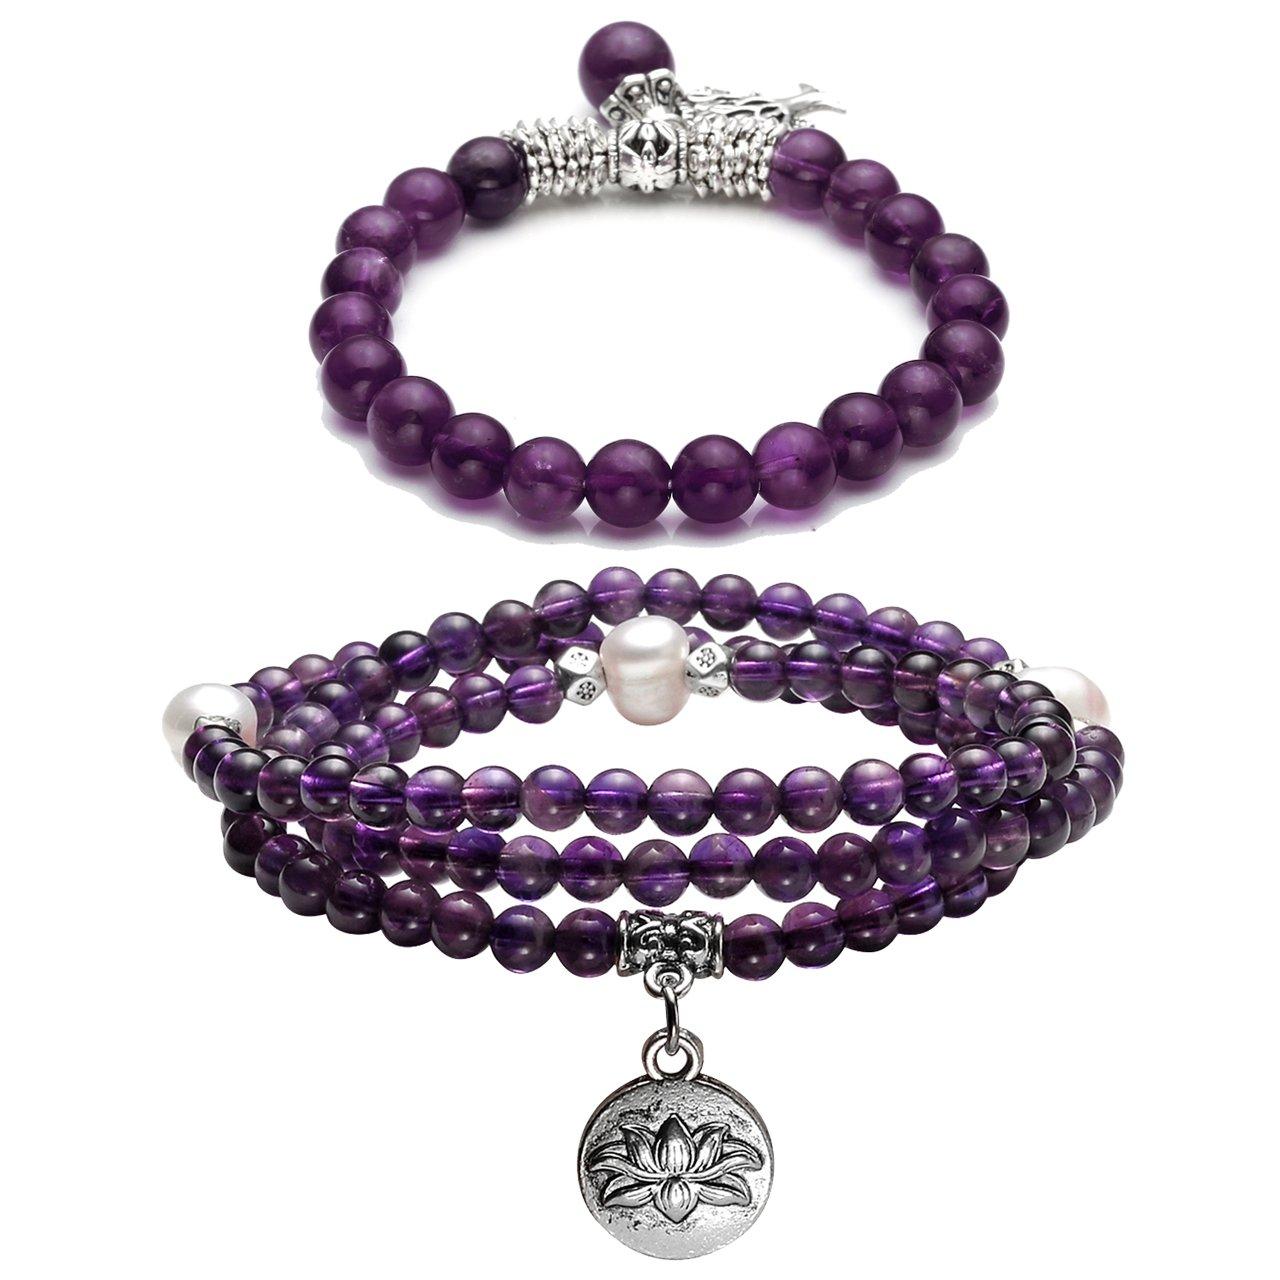 Top Plaza Natural Amethyst Gemstones Healing Crystals Jewelry with 108 Mala Prayer Beads Tibetan Buddhist Wrap Bracelets Necklace & Tree of Life Lucky Stone Stretch Bracelet